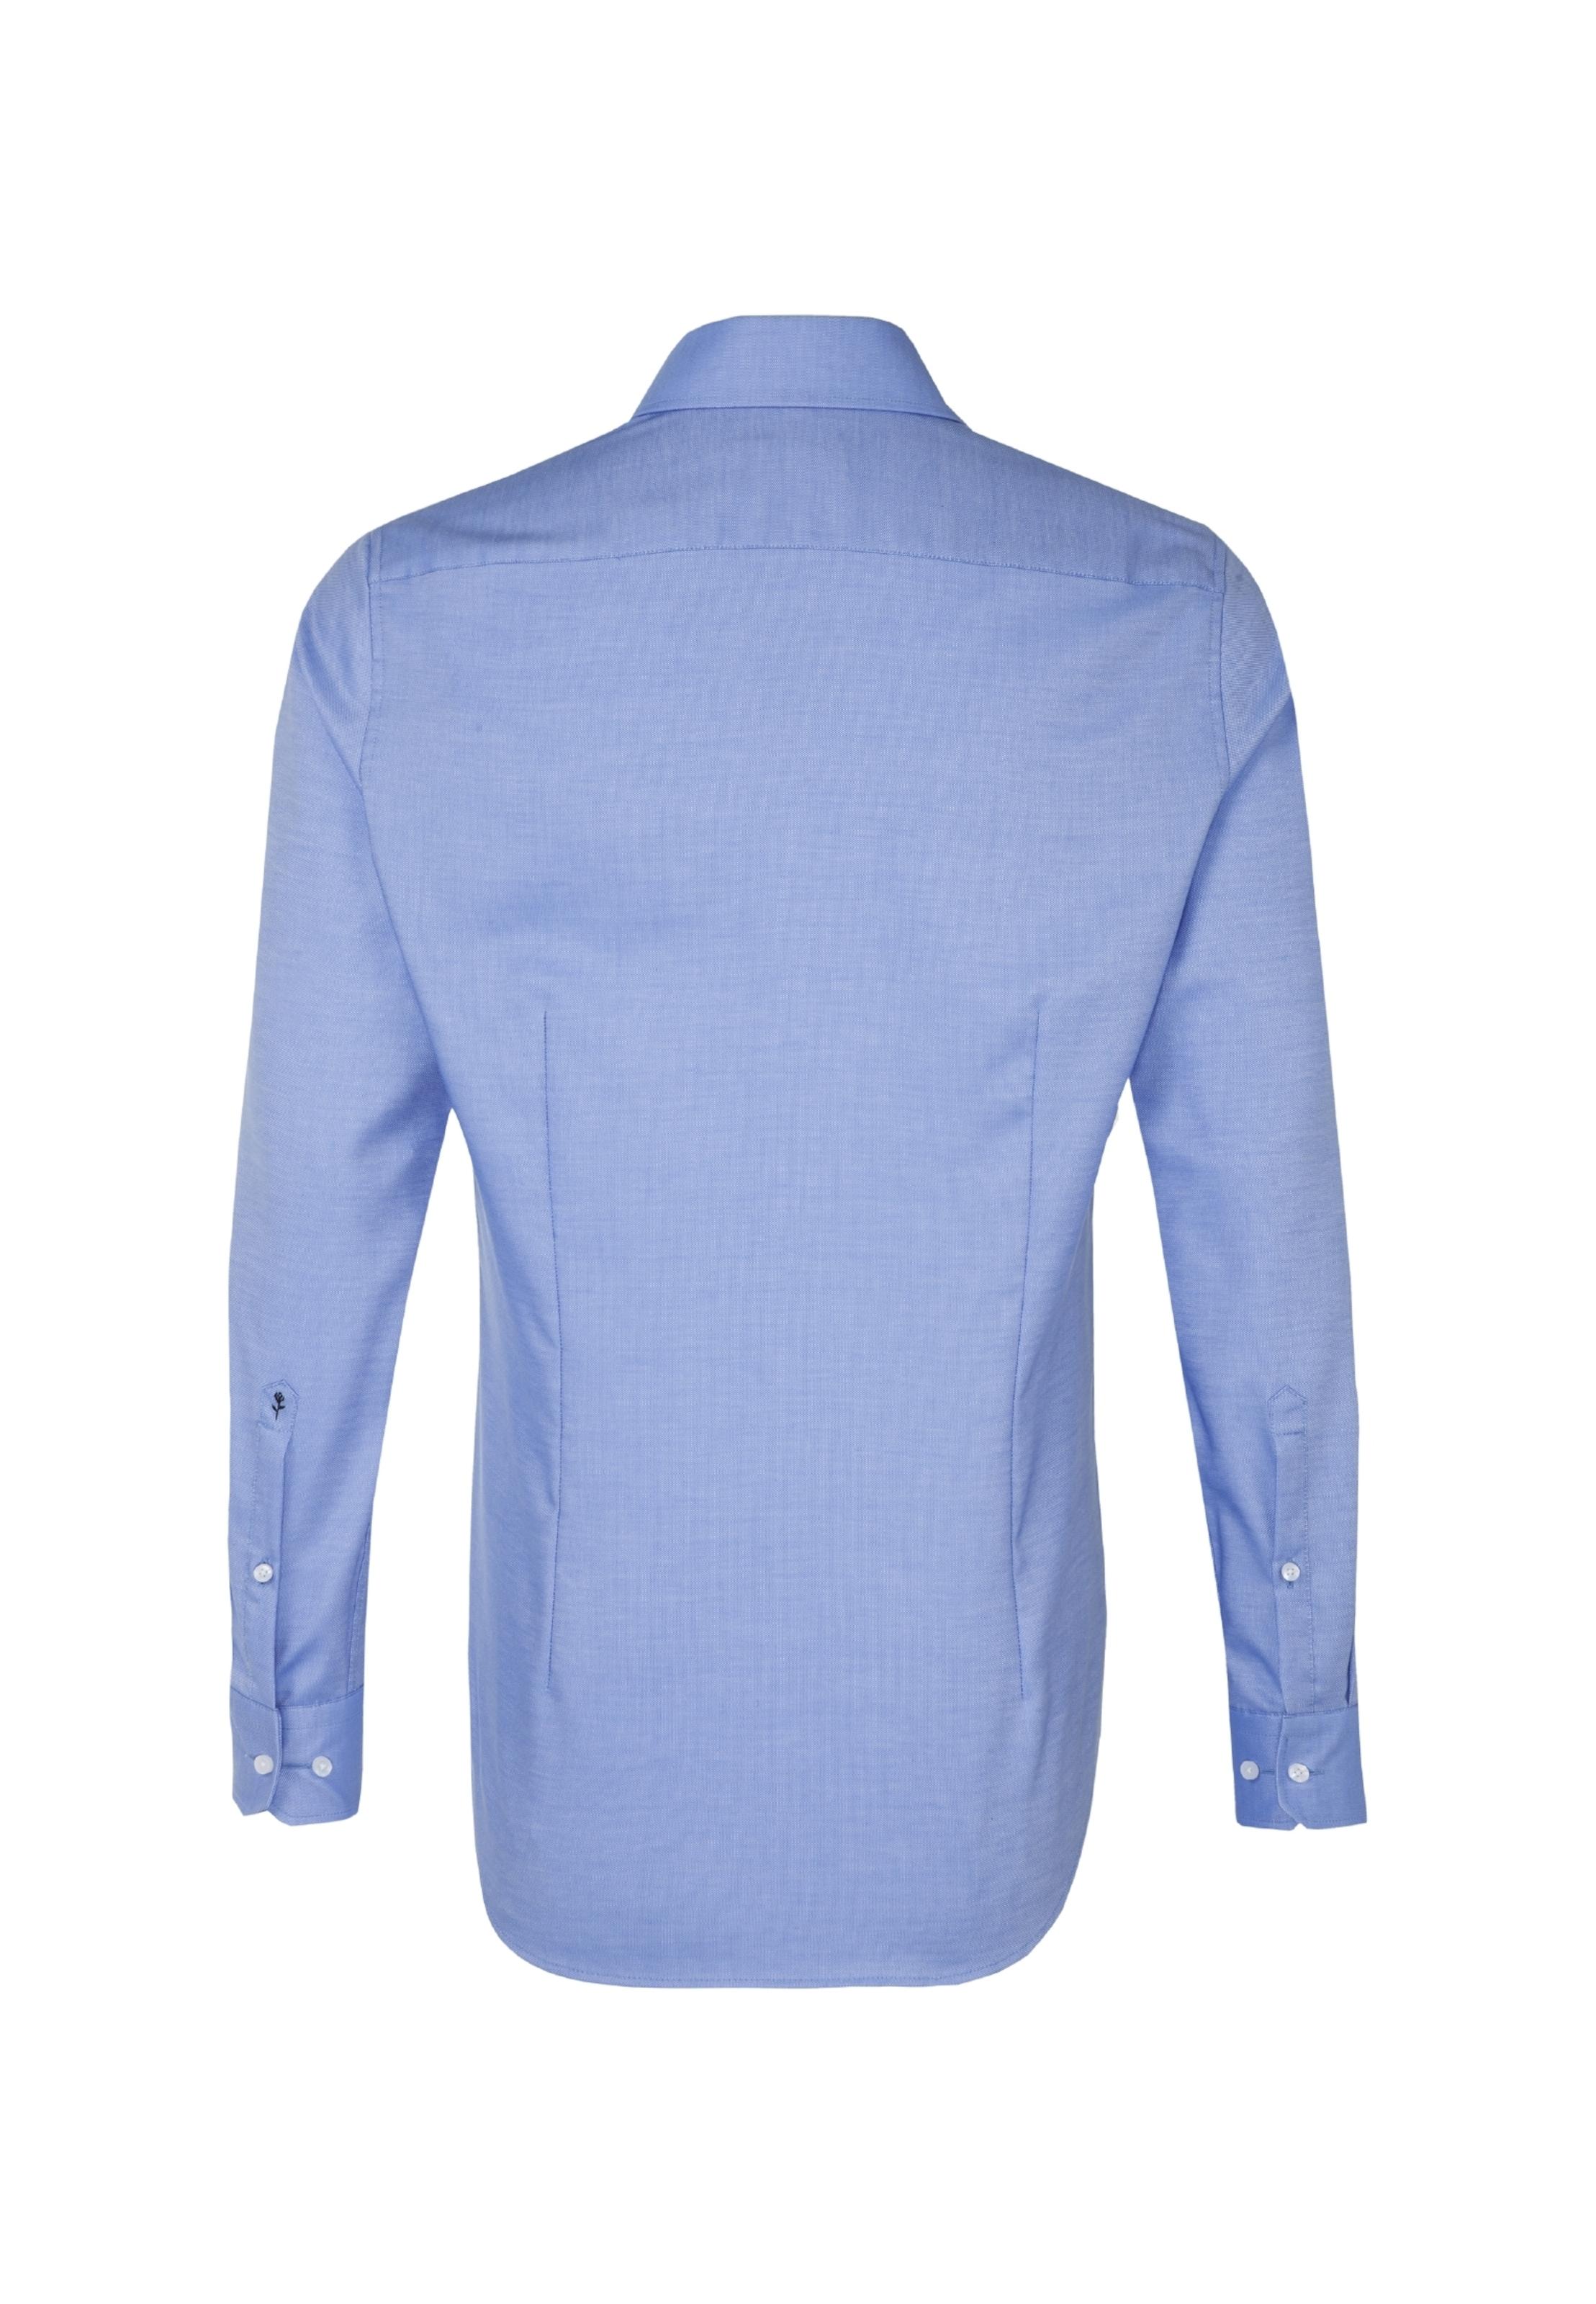 Business RoiBlanc Chemise Seidensticker En Bleu EI9De2YWHb